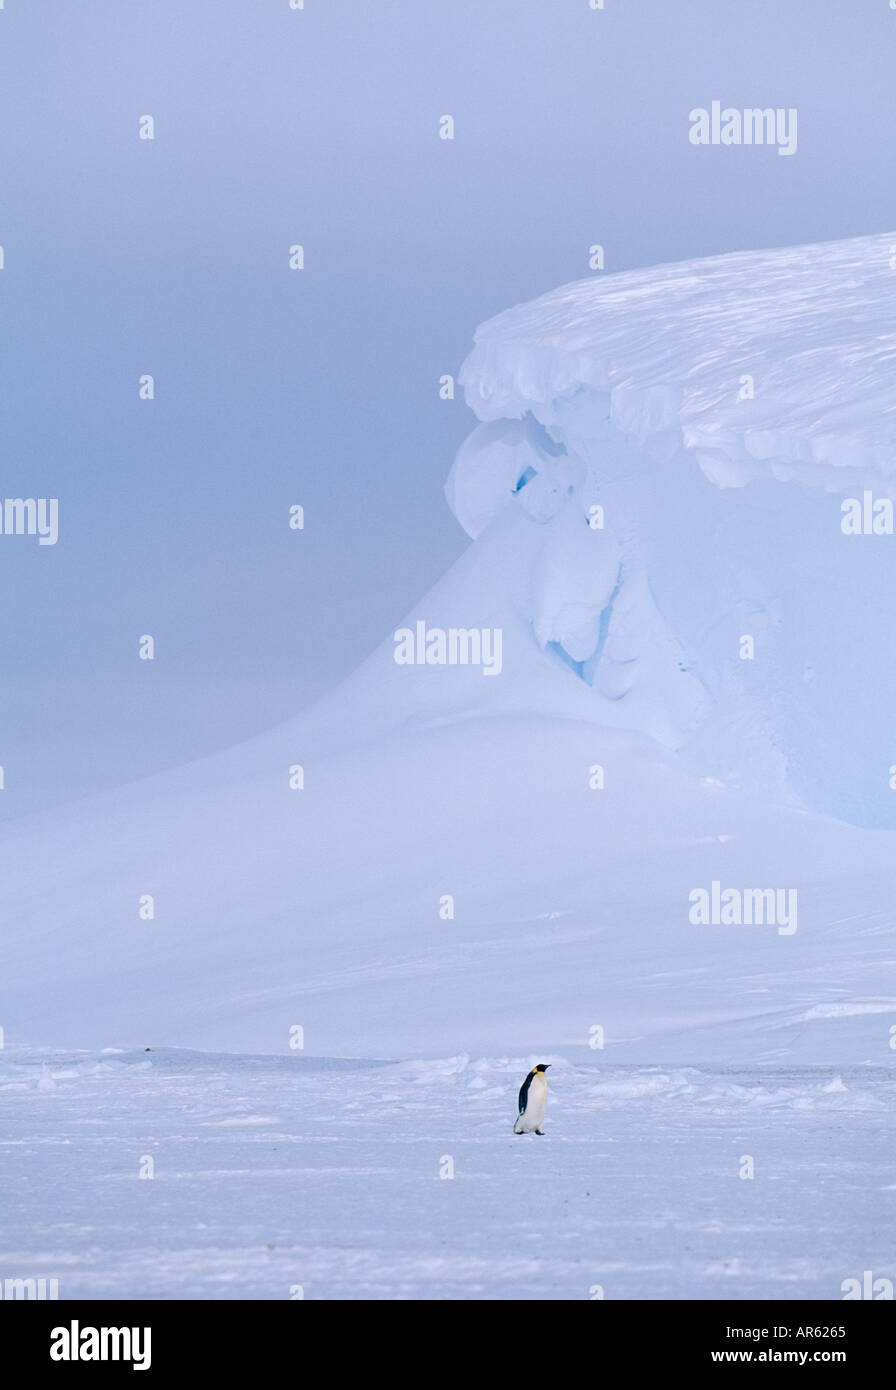 Emperor Penguin Aptenodytes forsteri lone adult returning to colony across sea ice of Weddell Sea Antarctica November - Stock Image